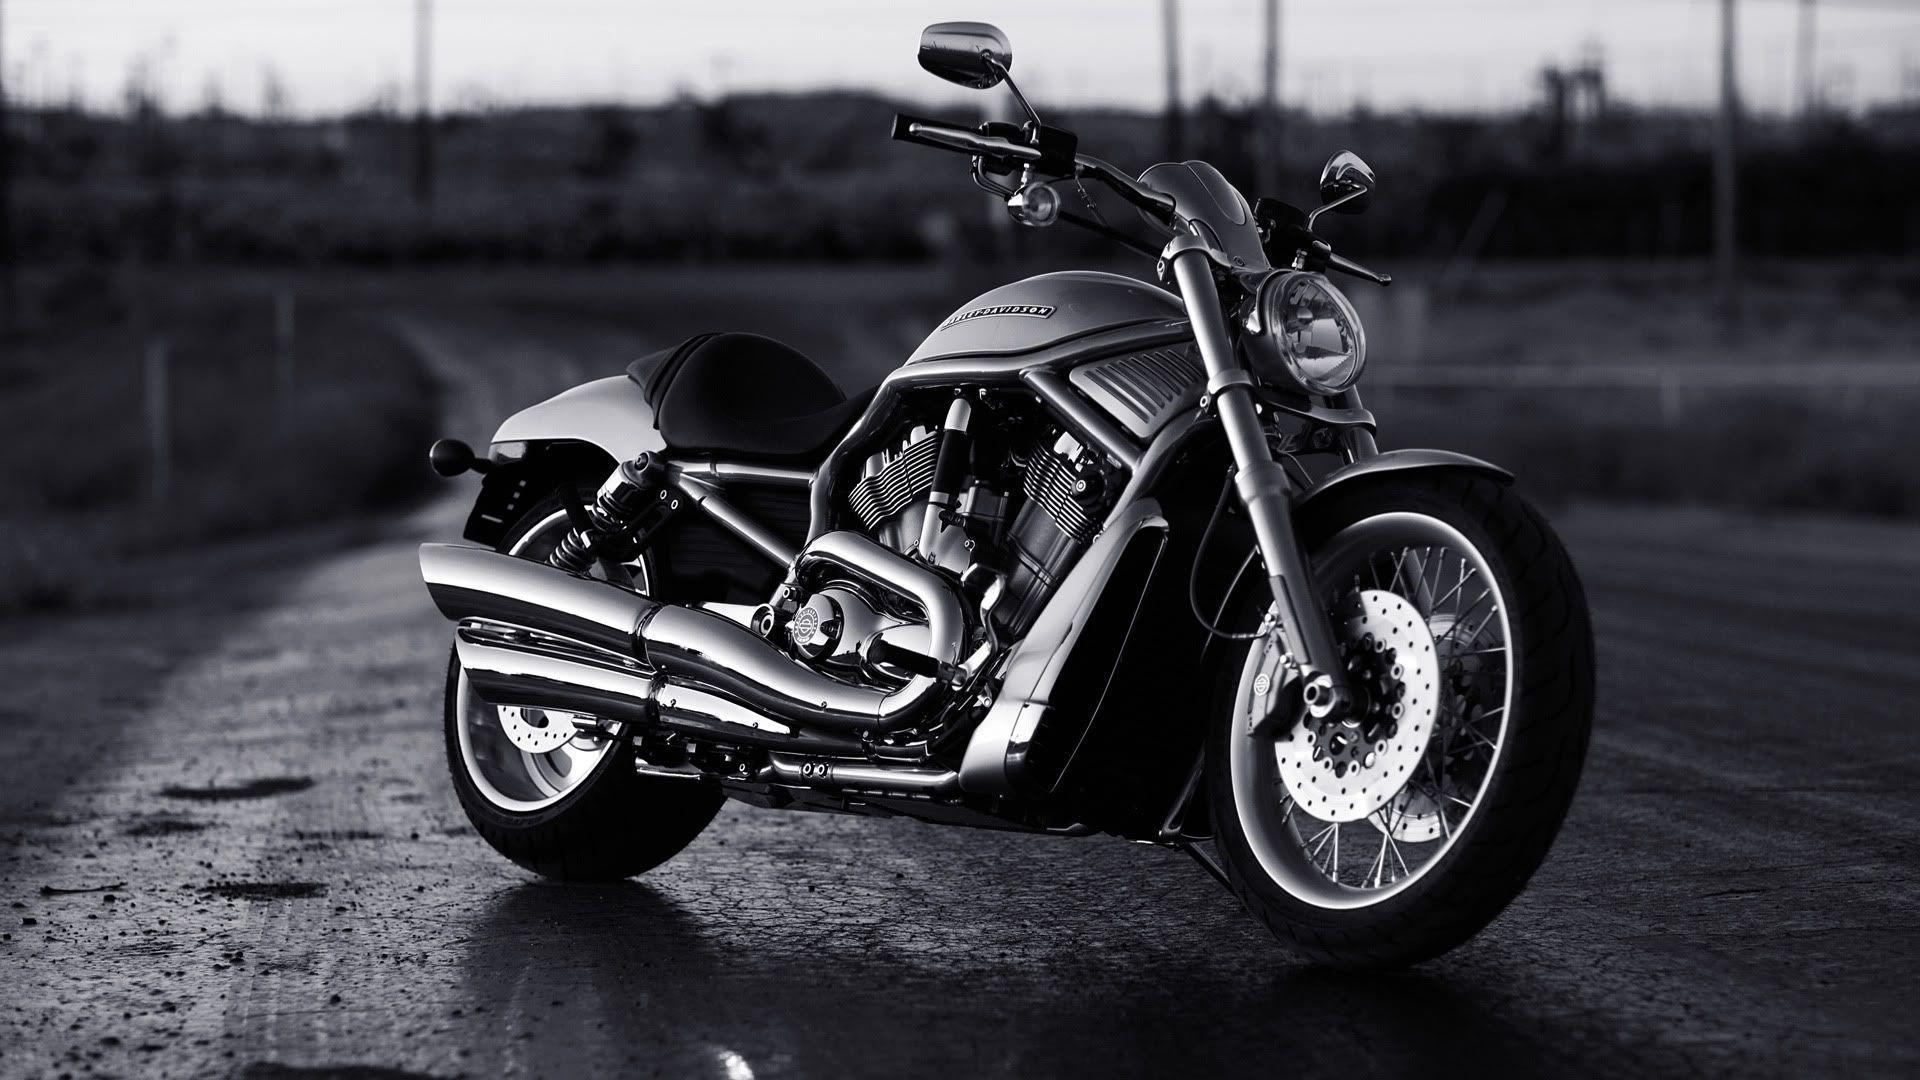 cruiser motorcycle wallpaper hd - photo #21